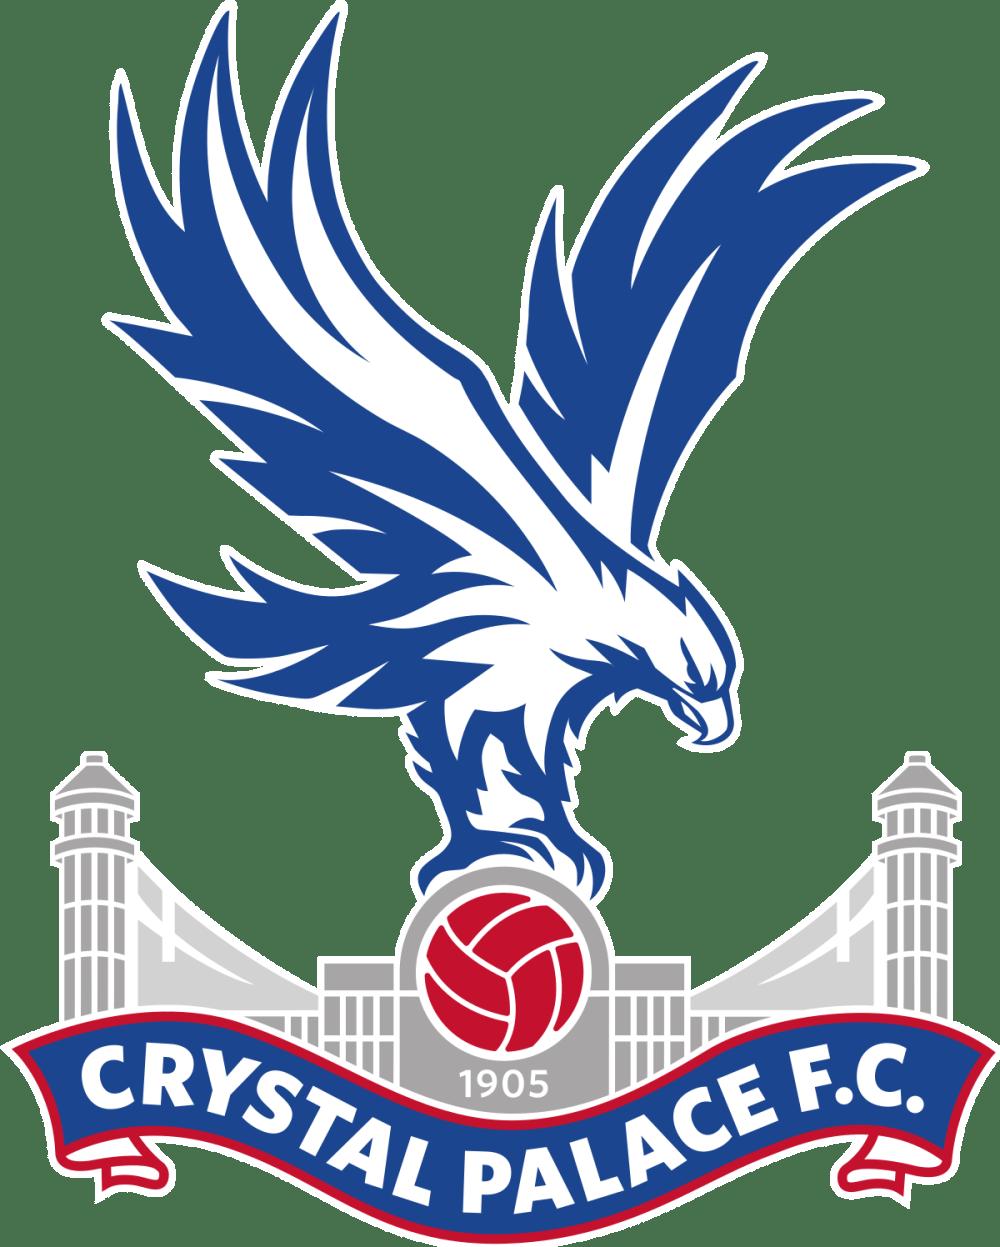 1200px-Crystal_Palace_FC_logo